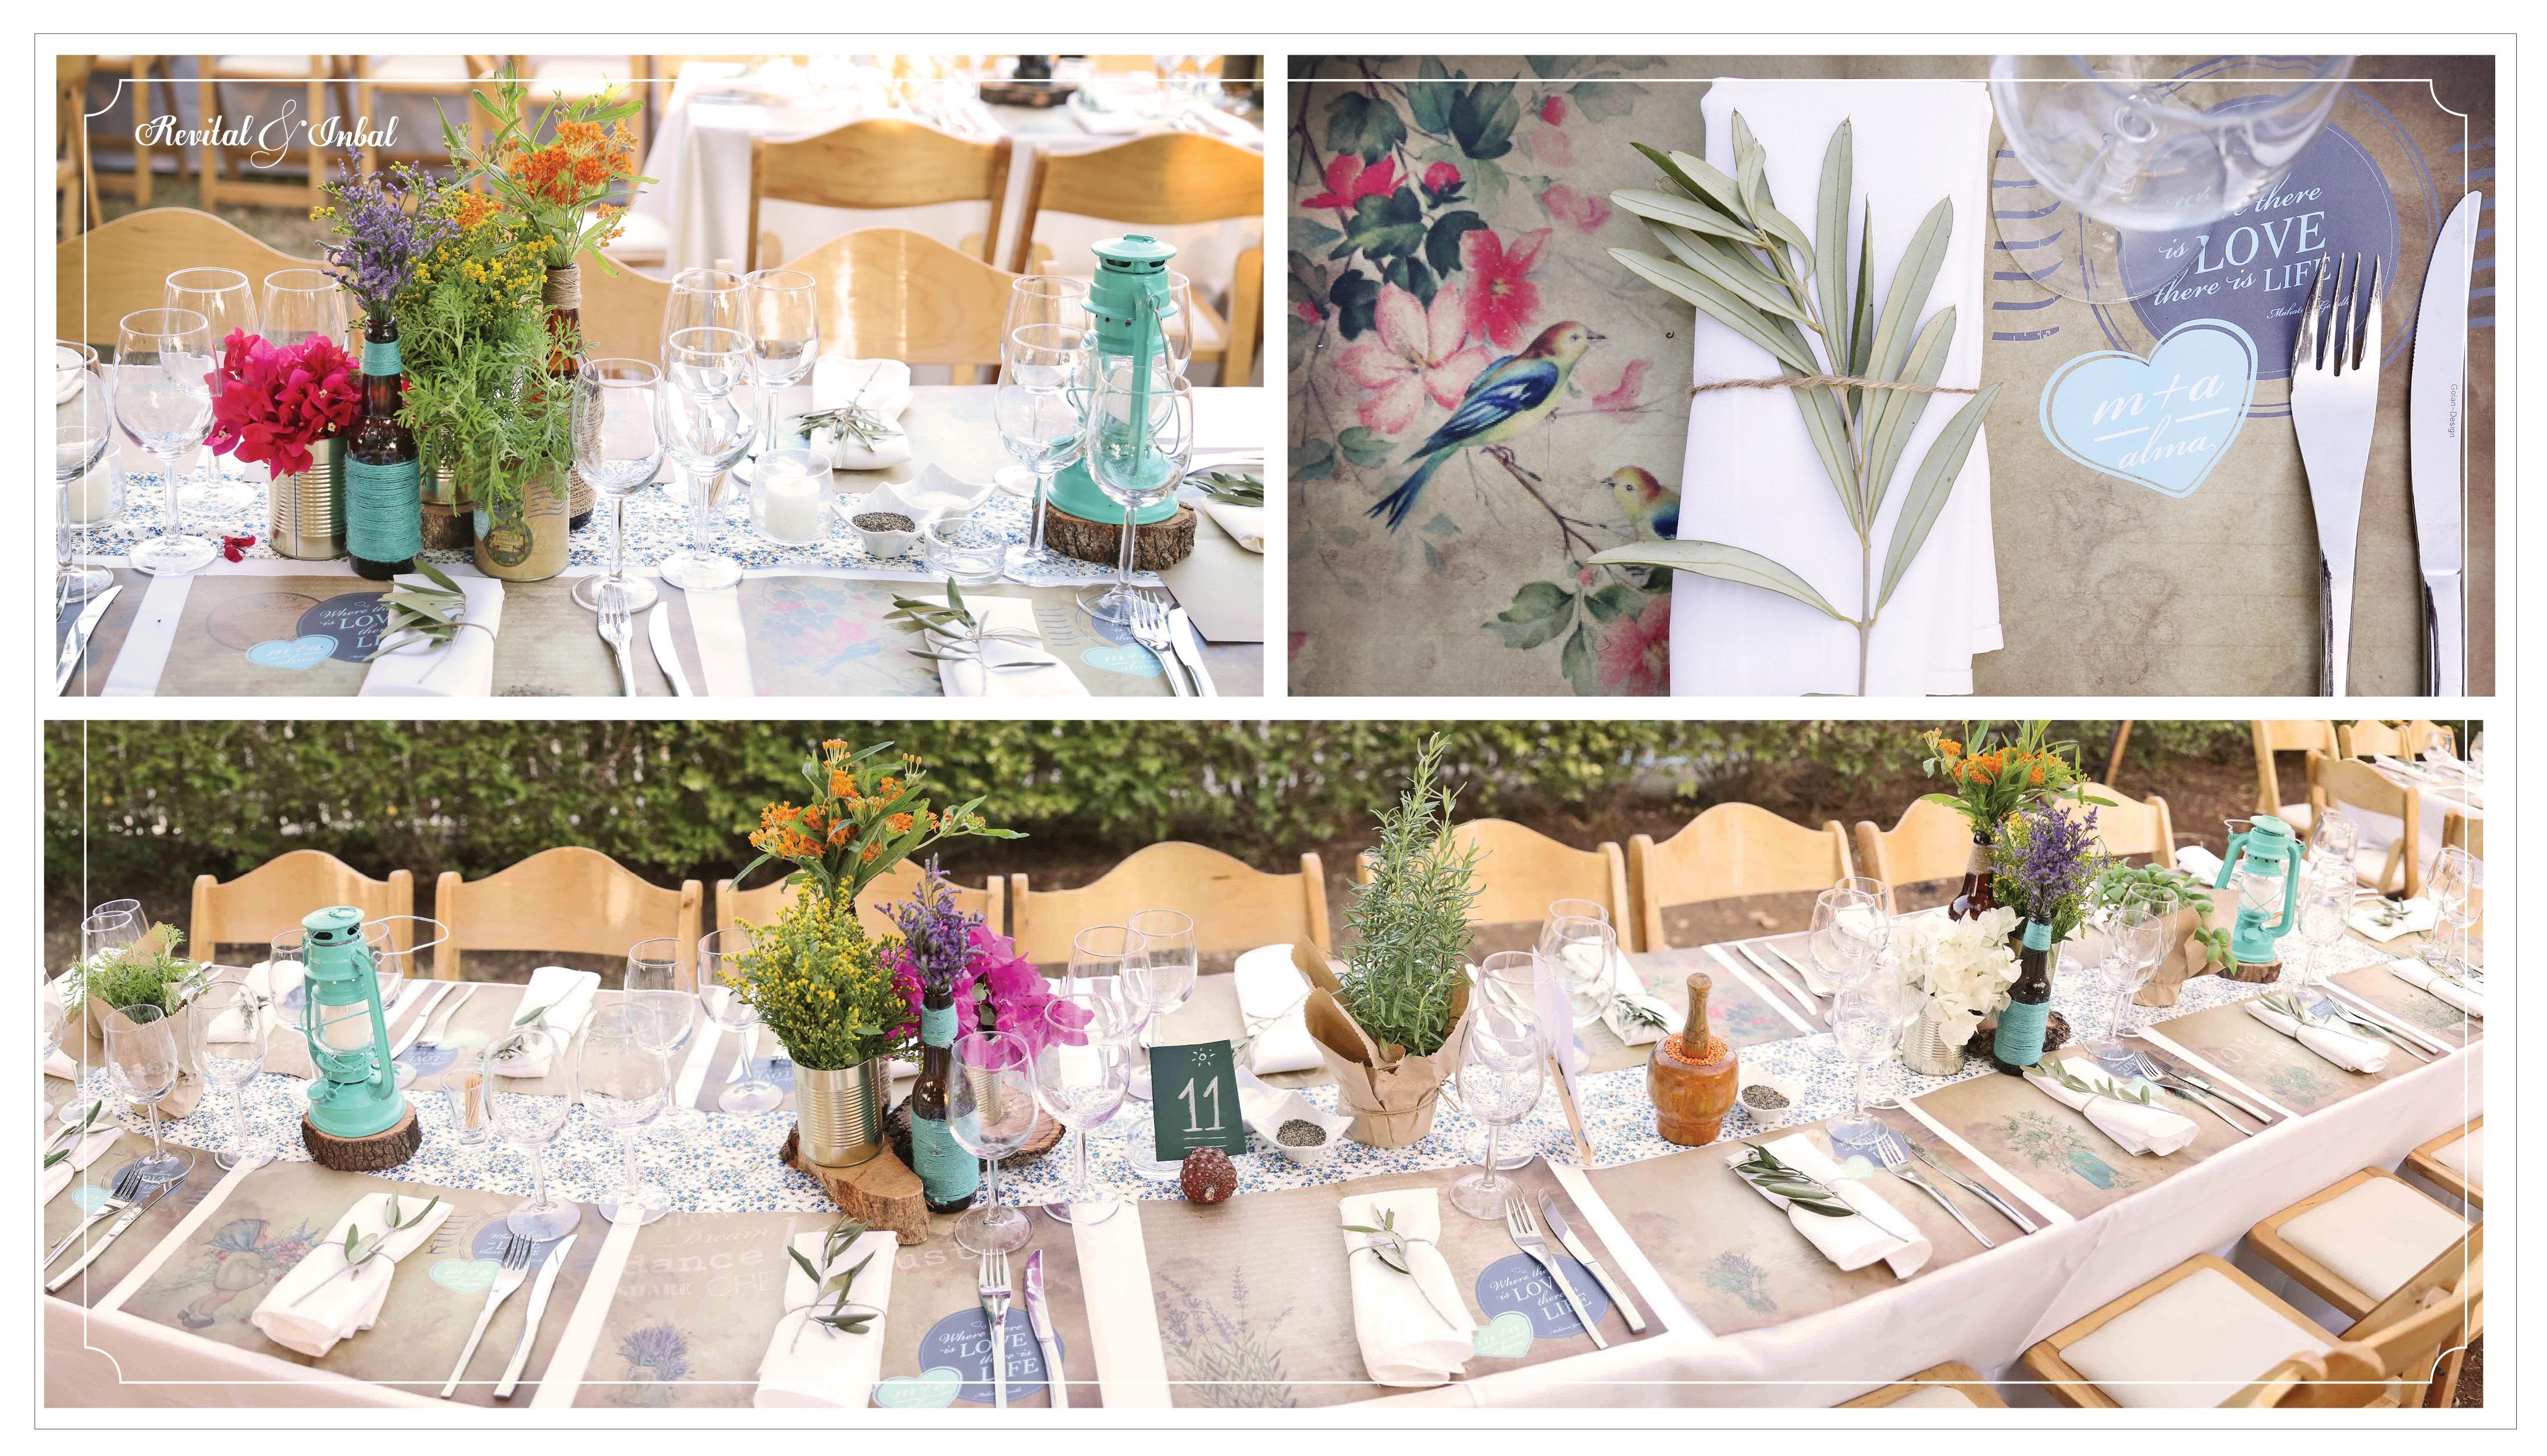 Peasant wedding design עיצוב חתונת איכרים Table